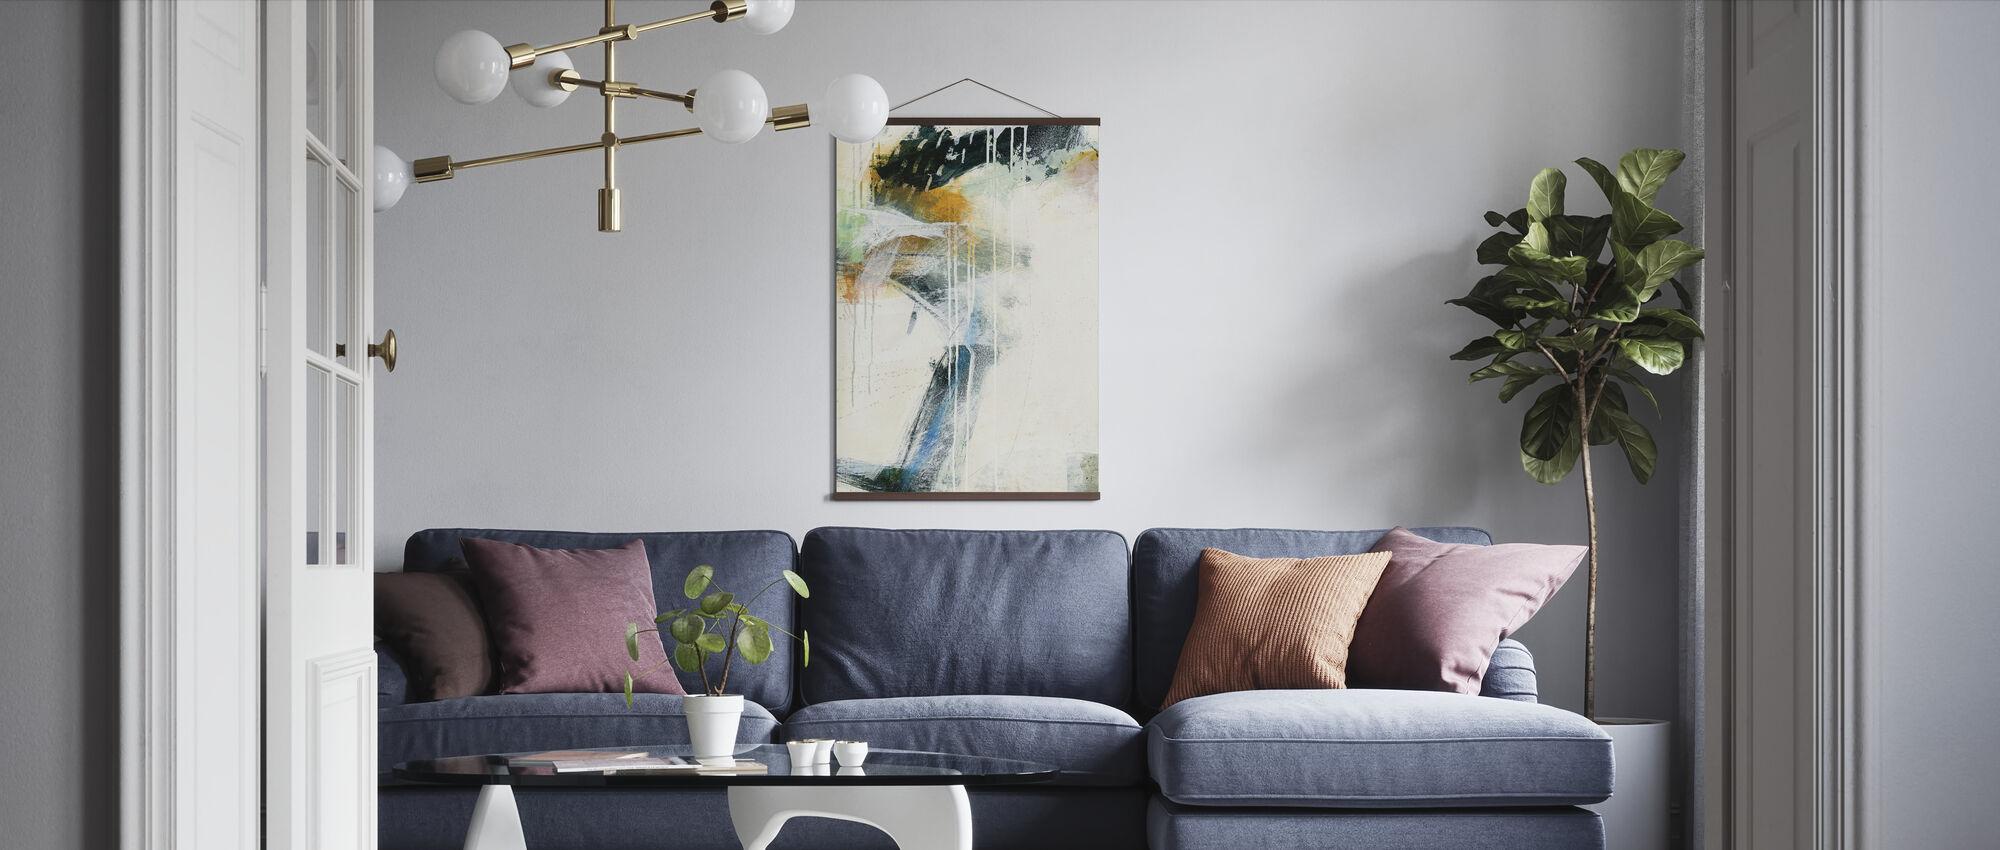 Turbulenz II - Poster - Wohnzimmer